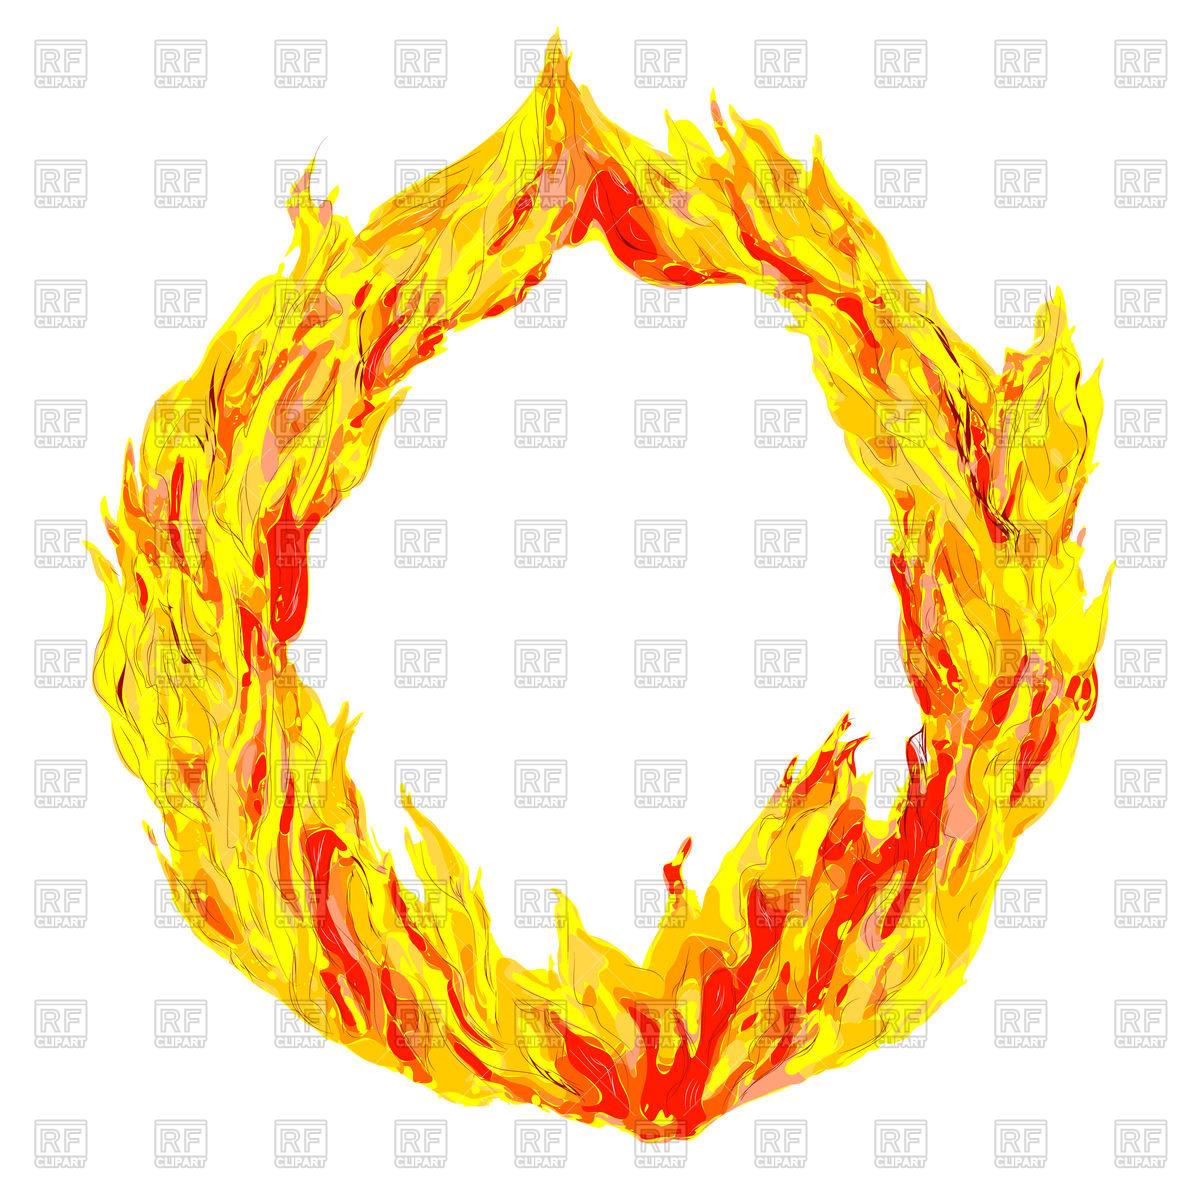 Fire circle clipart #6